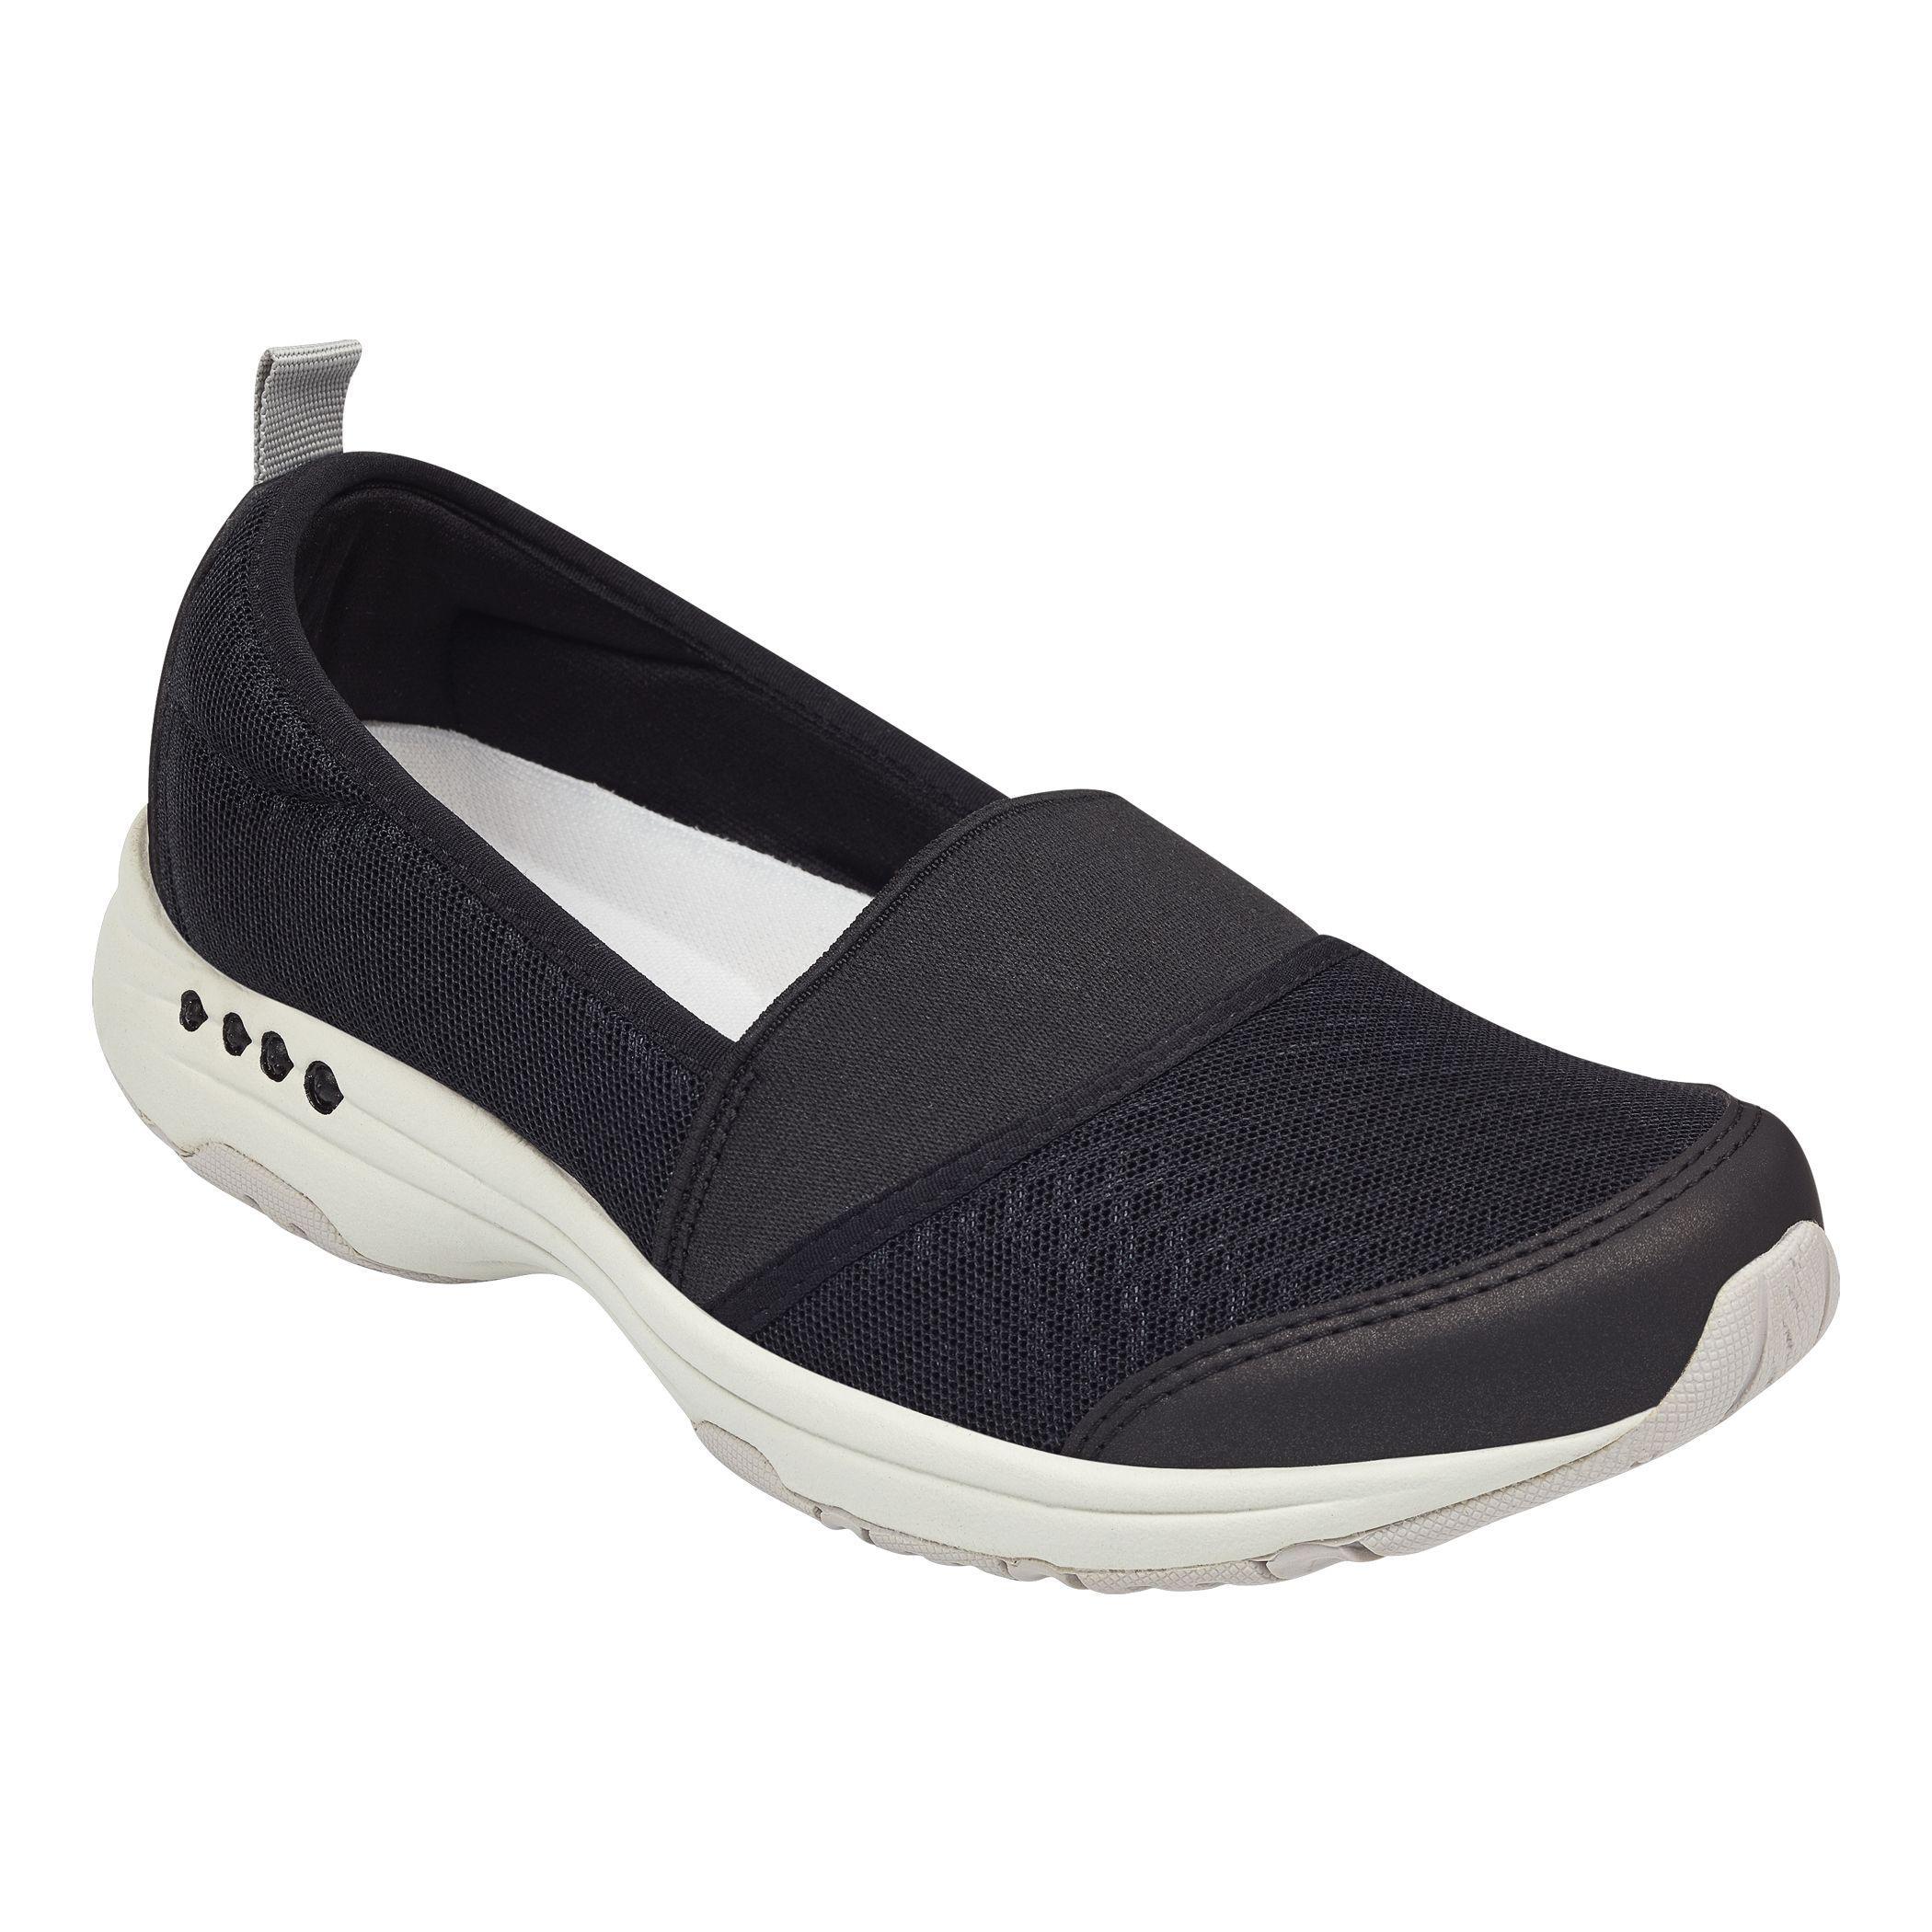 cbd05e4524fc Lyst - Easy Spirit Twist Slip-on Sneakers in Black - Save 58%